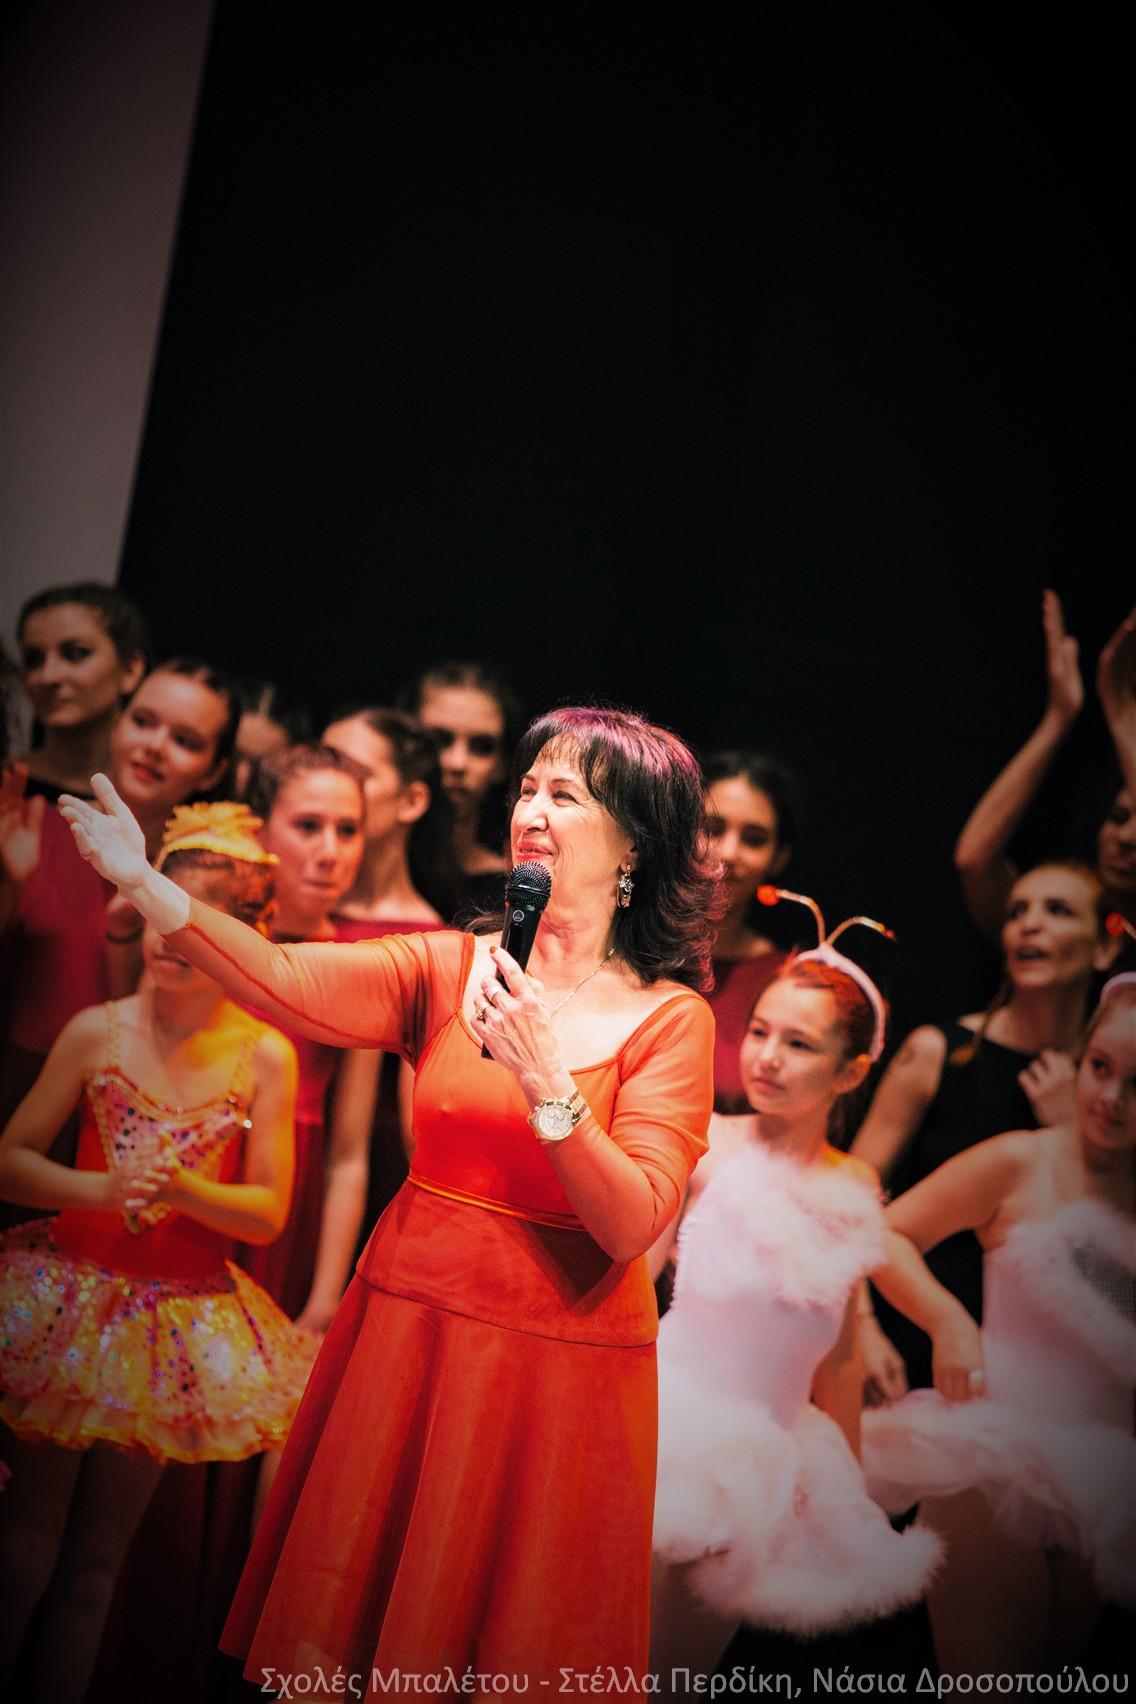 87d54e8eac8 Σχολές Μπαλέτου Σ.Περδίκη - Ν.Δροσοπούλου, Μελίσσια & Αθήνα (Γκύζη)